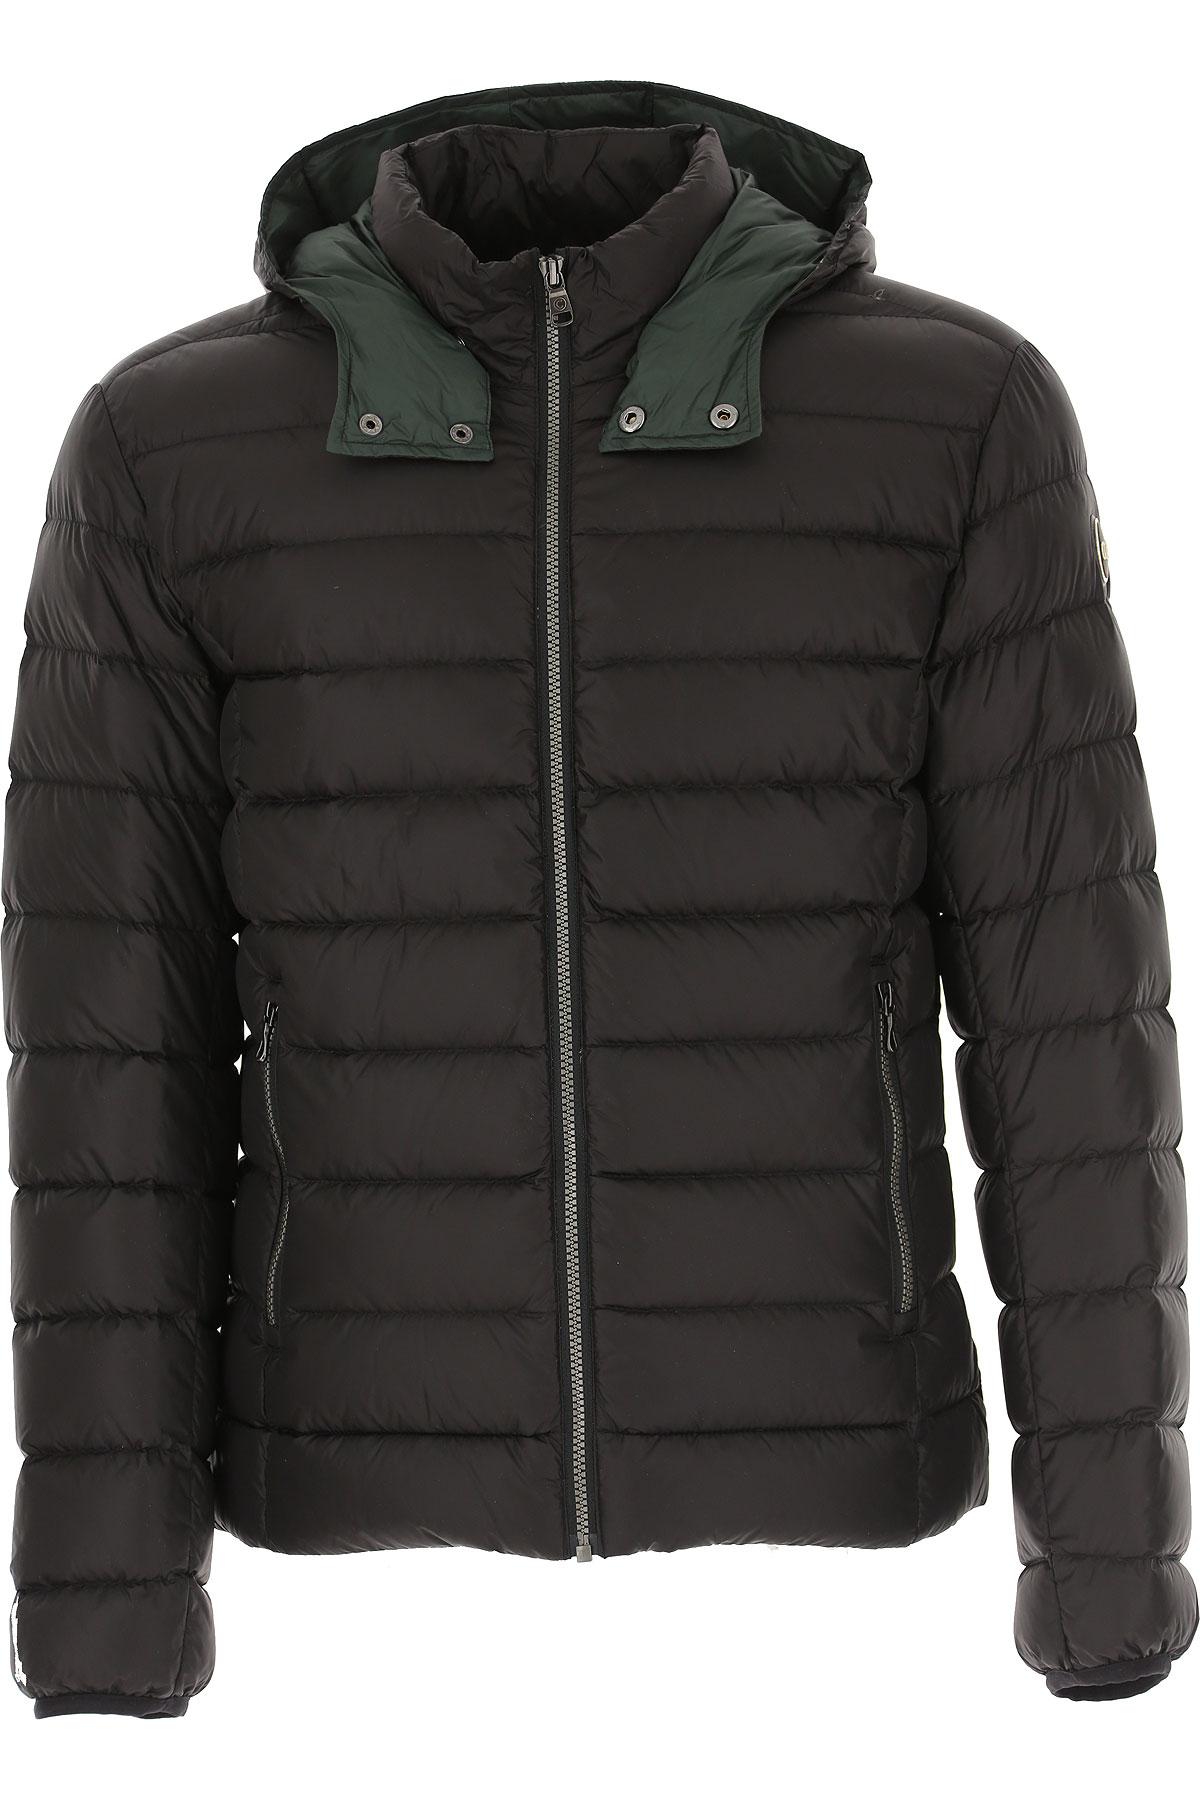 Colmar Down Jacket for Men, Puffer Ski Jacket On Sale, Black, polyester, 2019, L M S XL XXL